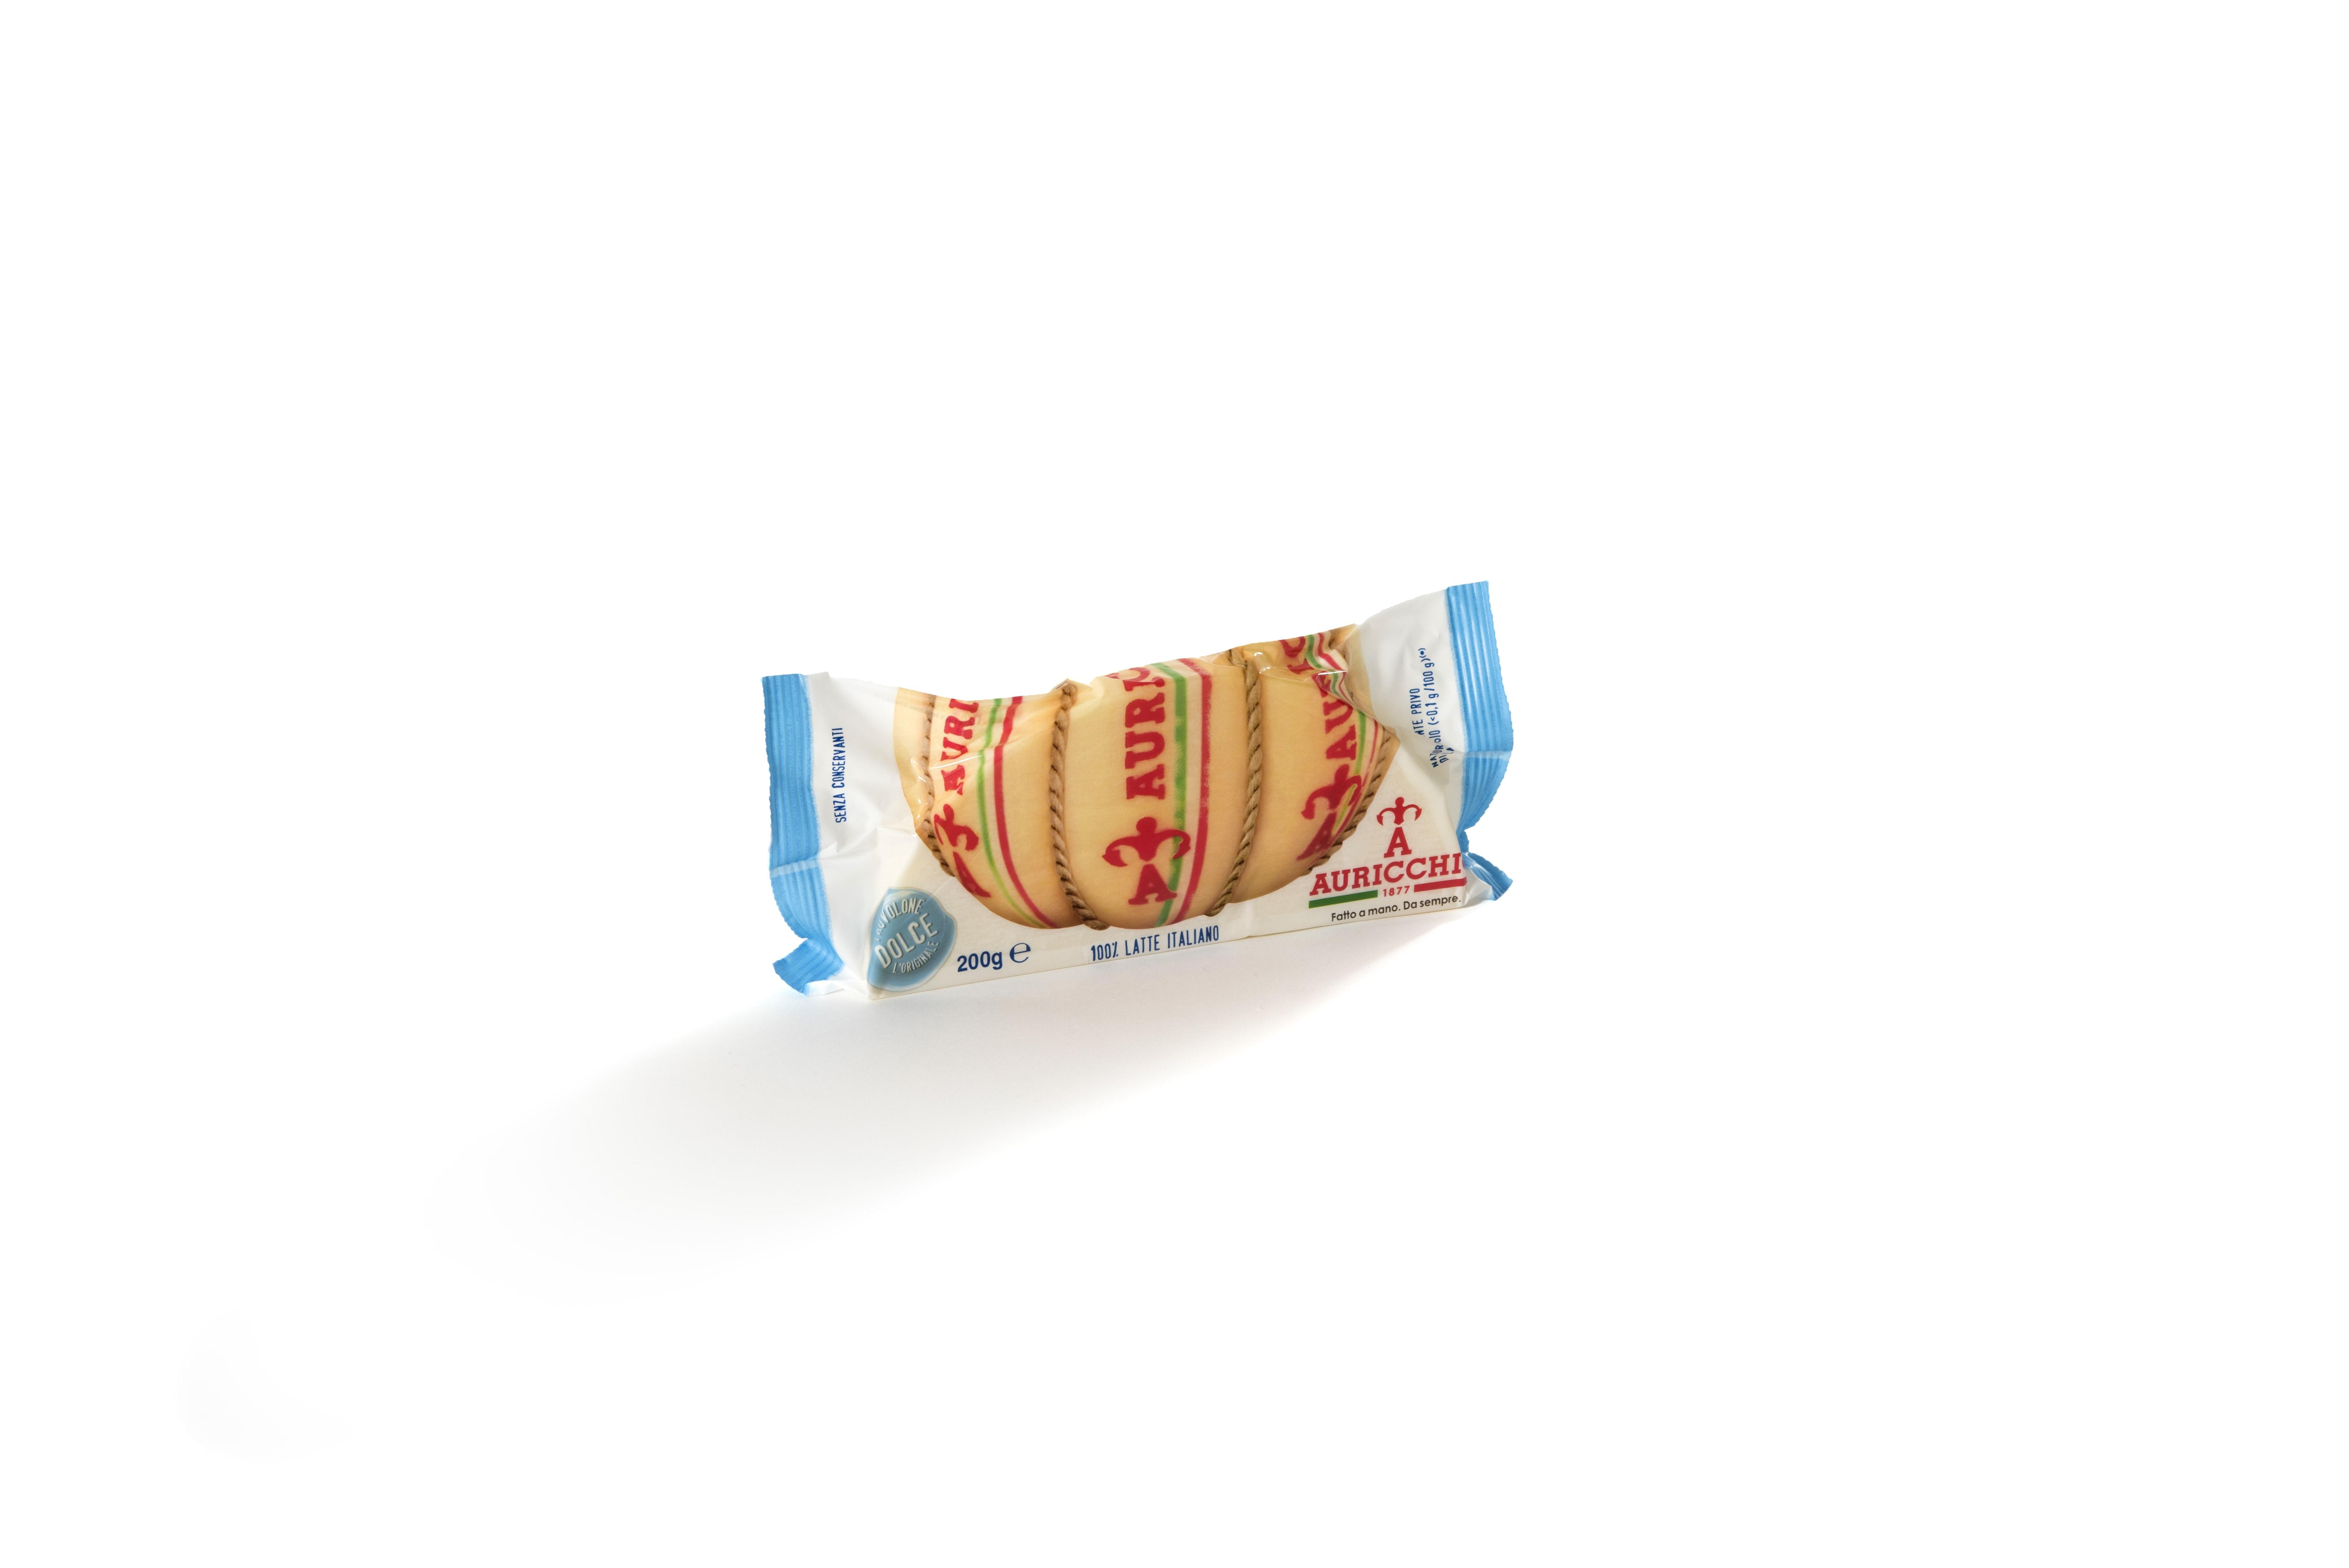 Auricchio Provolone Dolce – 300 g